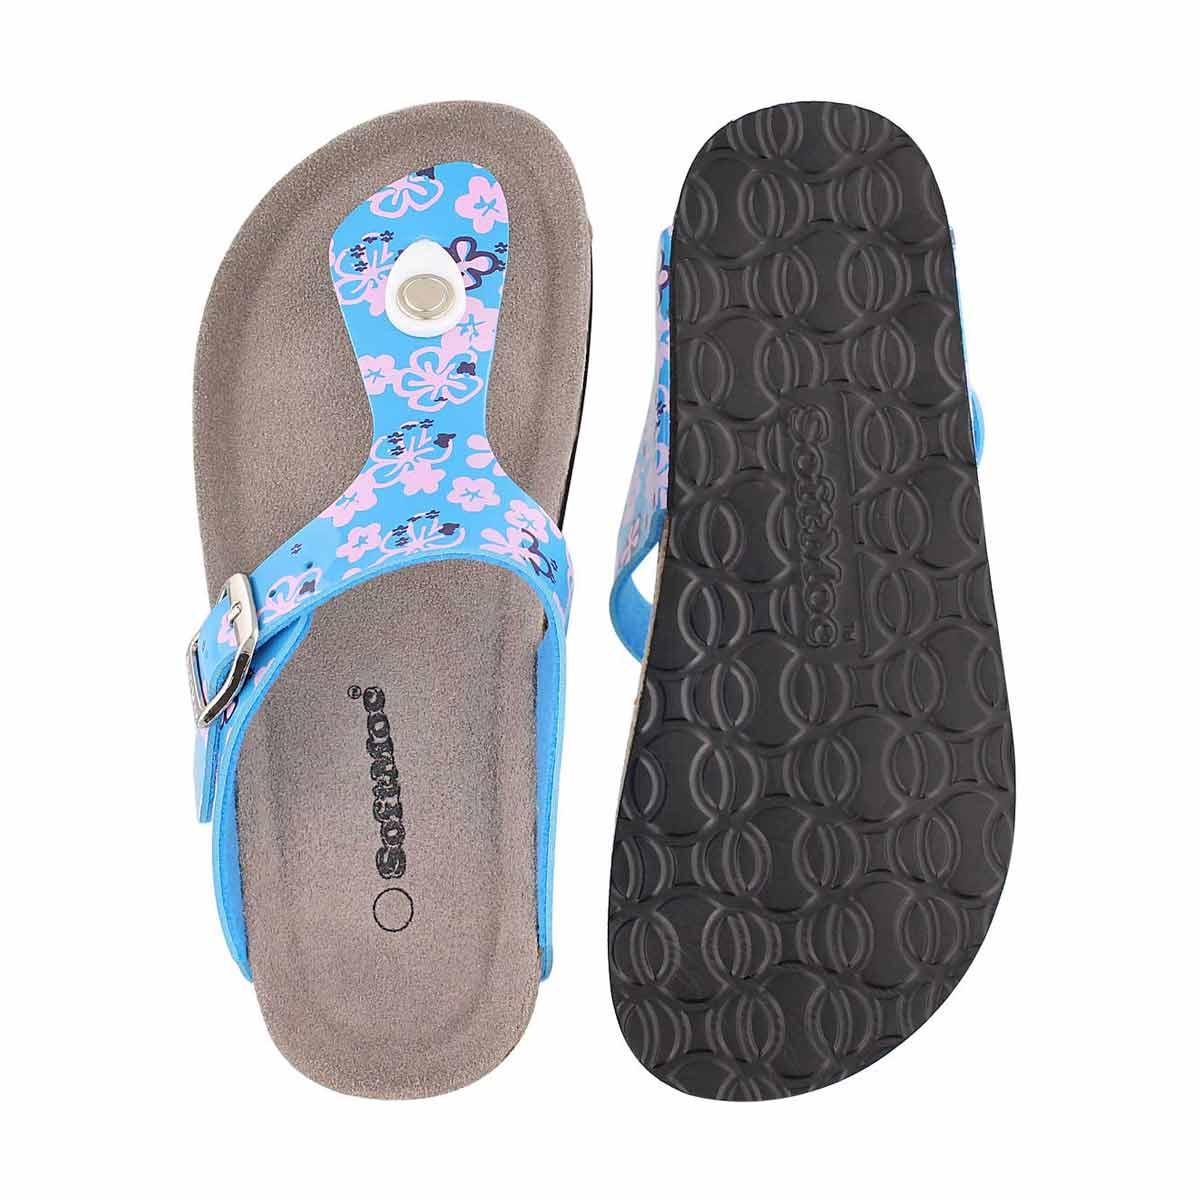 Grls Alison2 blue print thong sandal